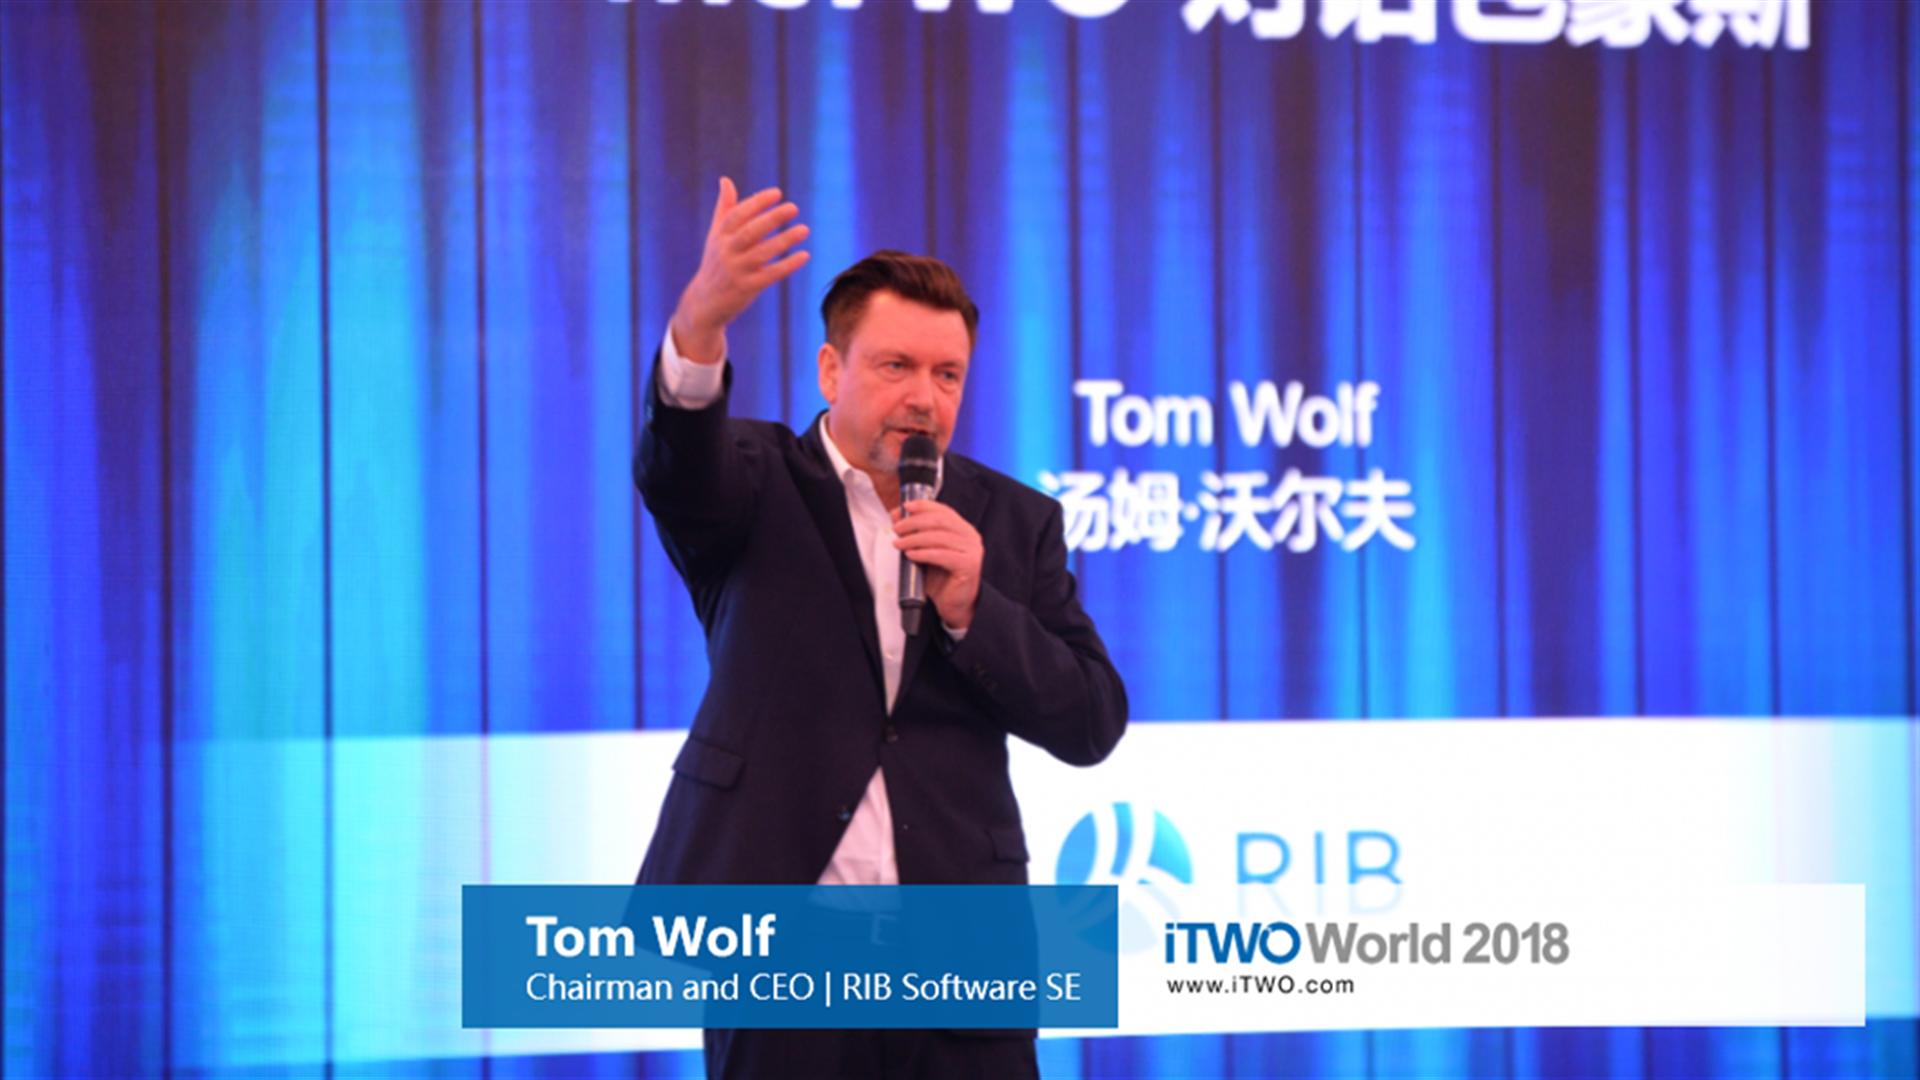 Tom Wolf